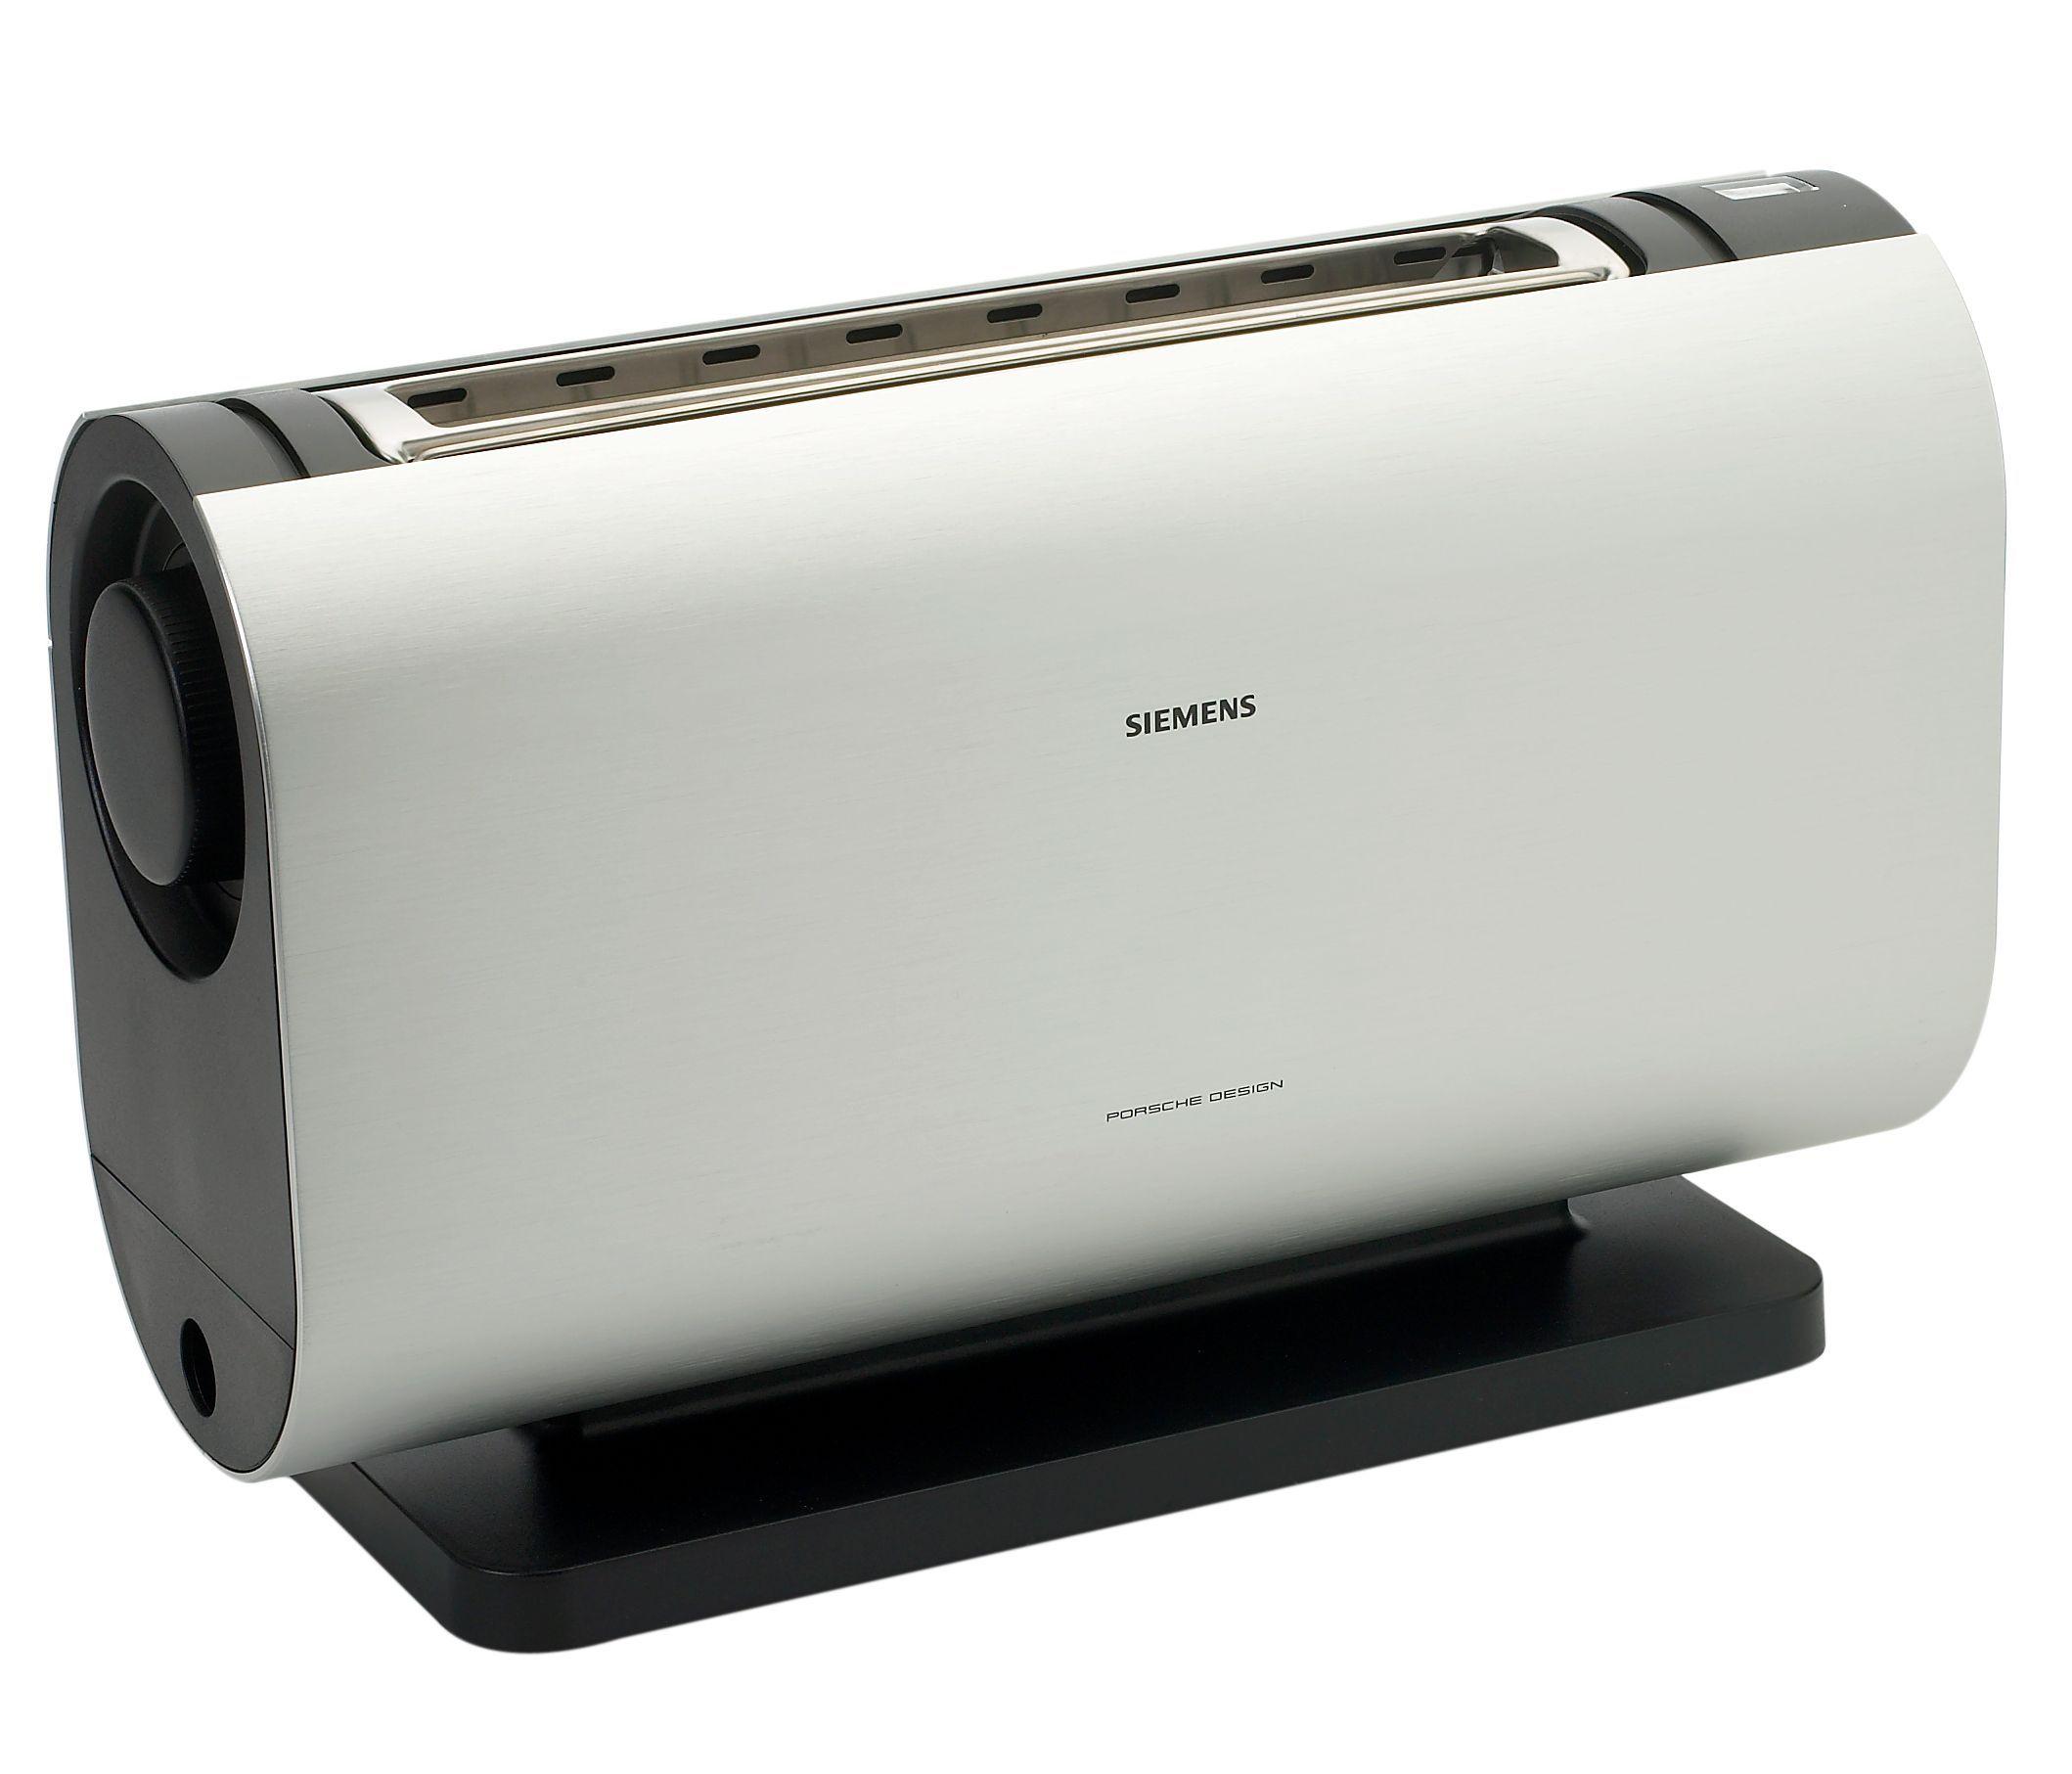 Siemens TT911P2GB Porsche toaster | Porsche Design | Pinterest